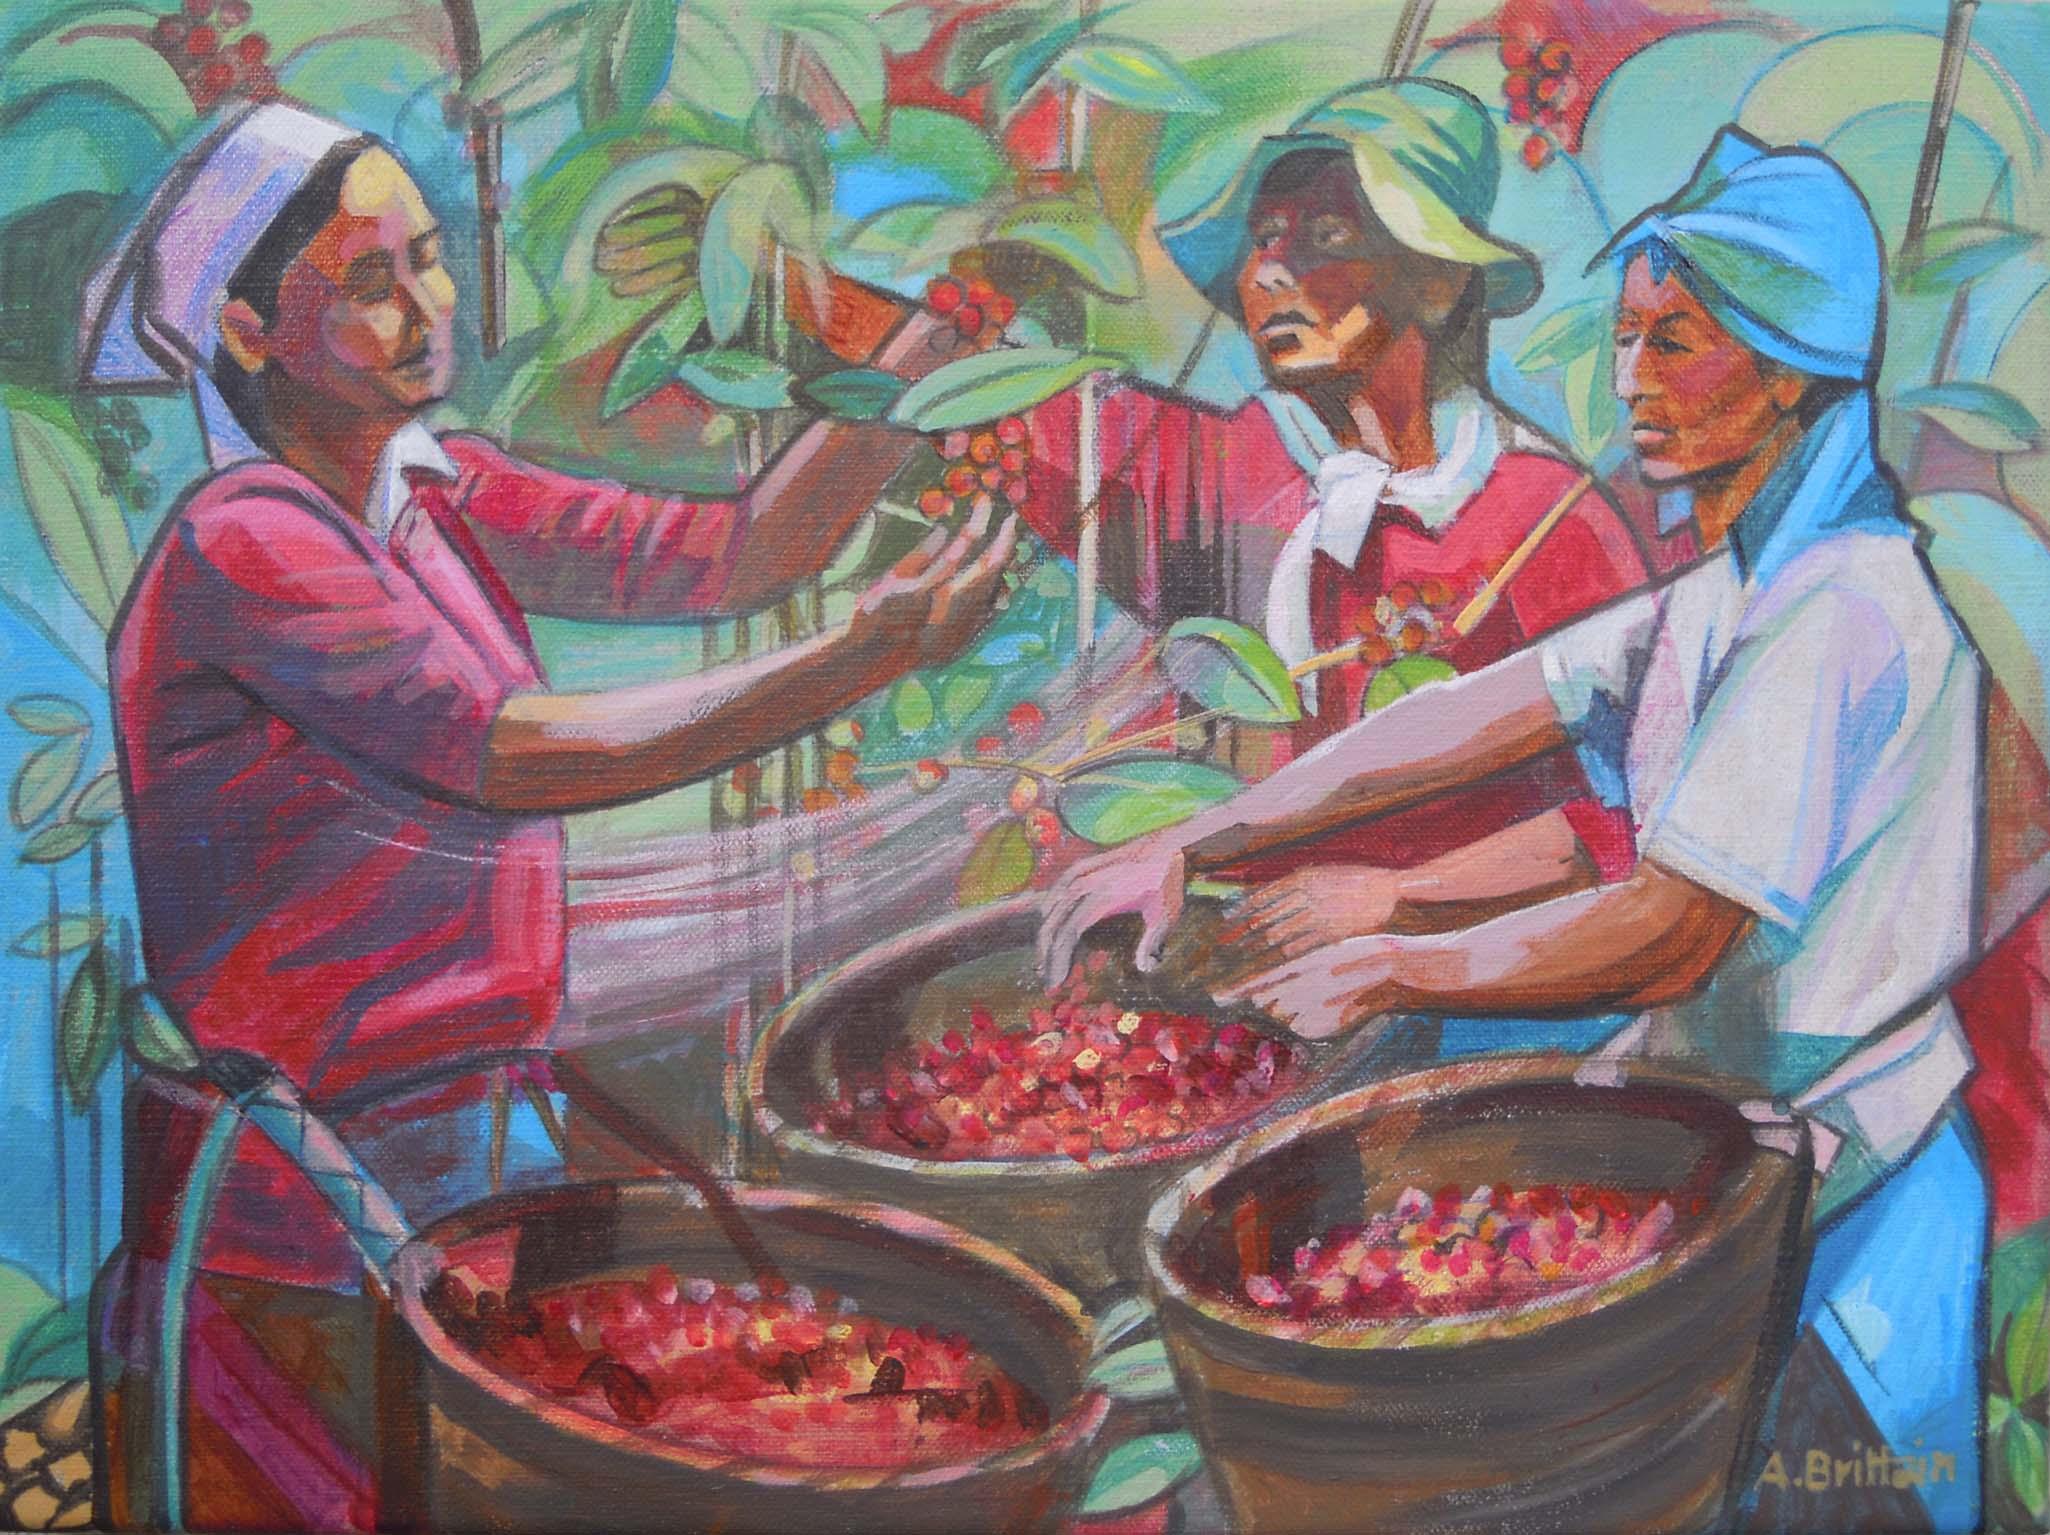 ANGELA BRITTAIN, Coffee Growers